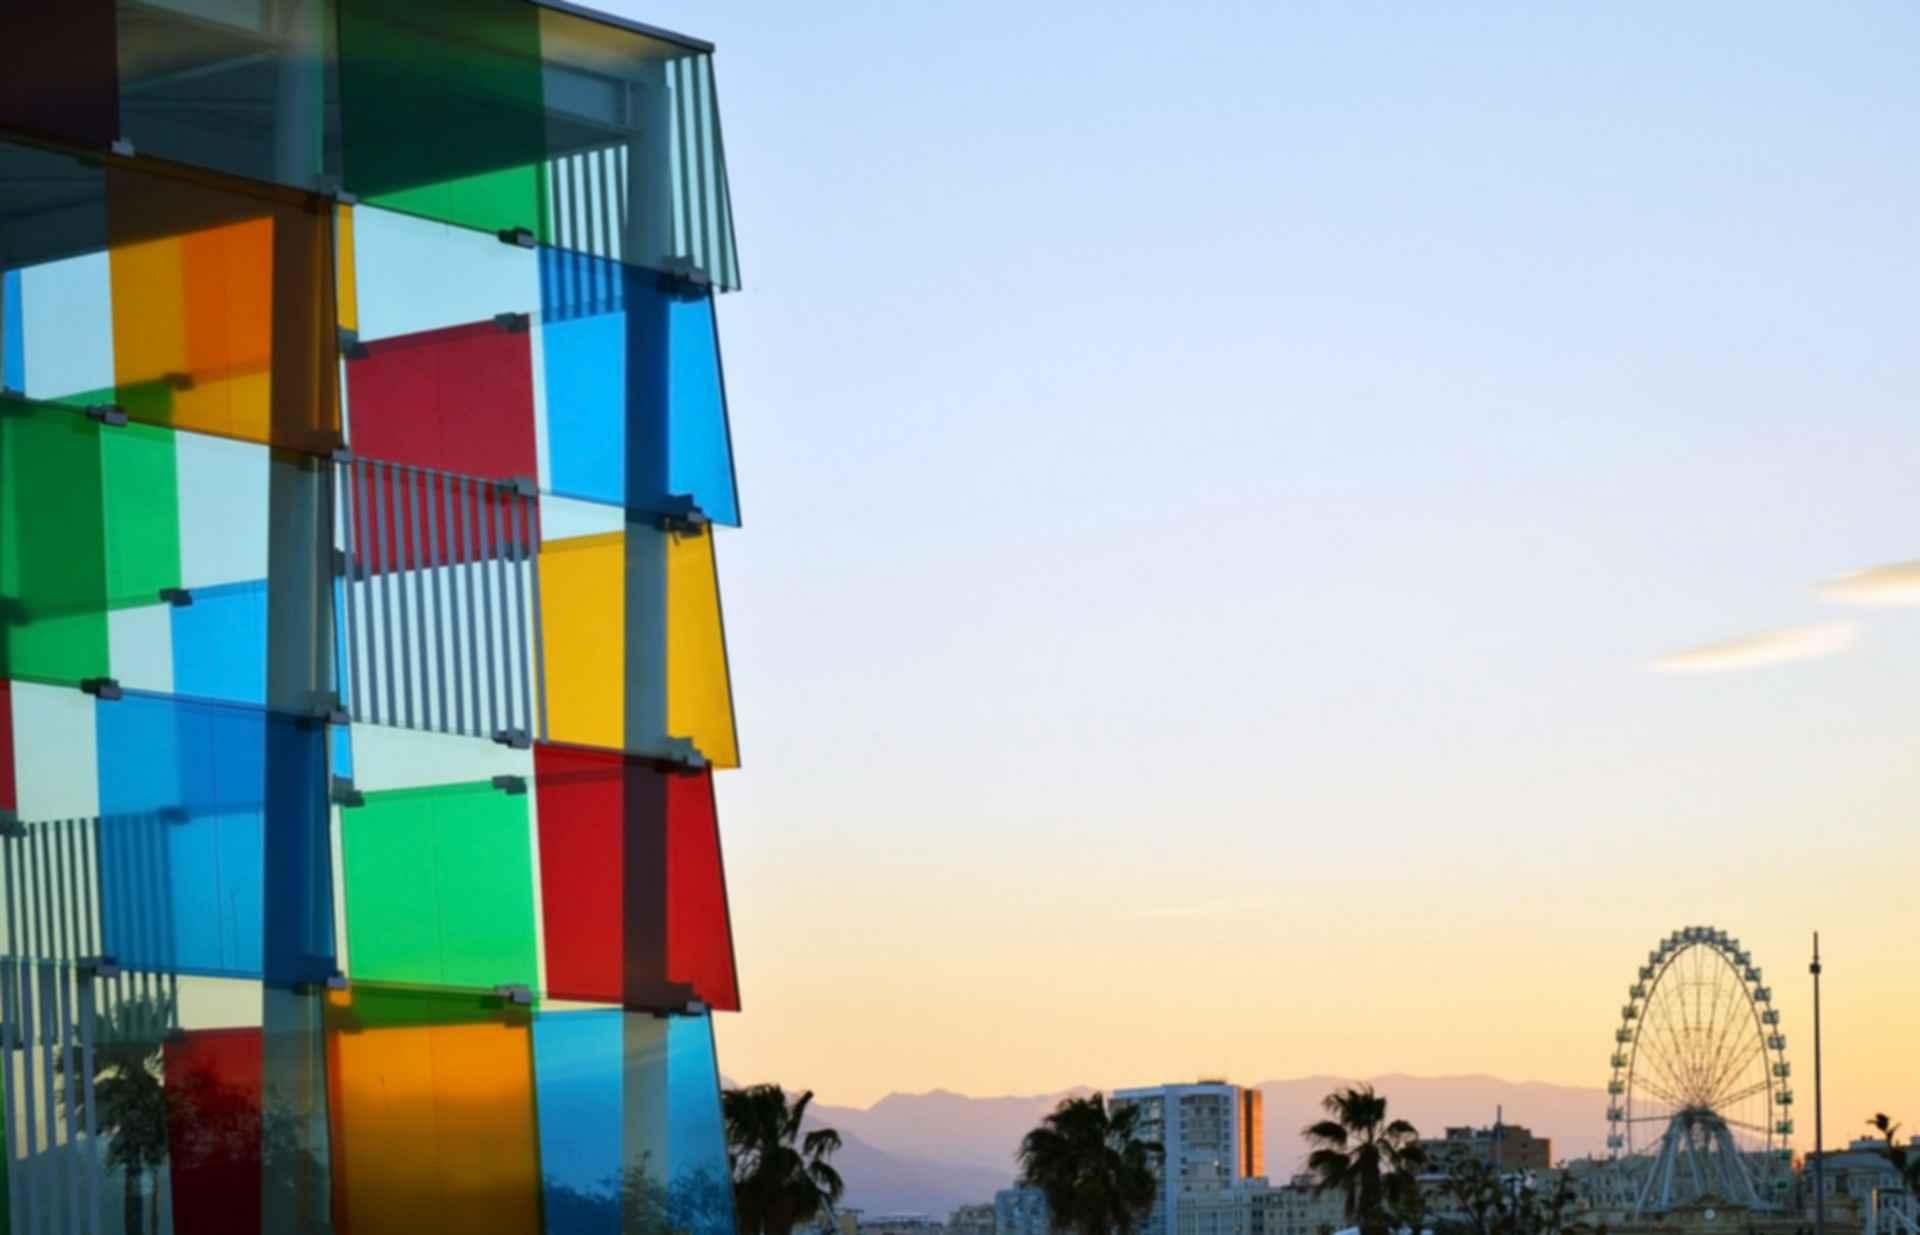 Centre Pompidou Malaga - Detail